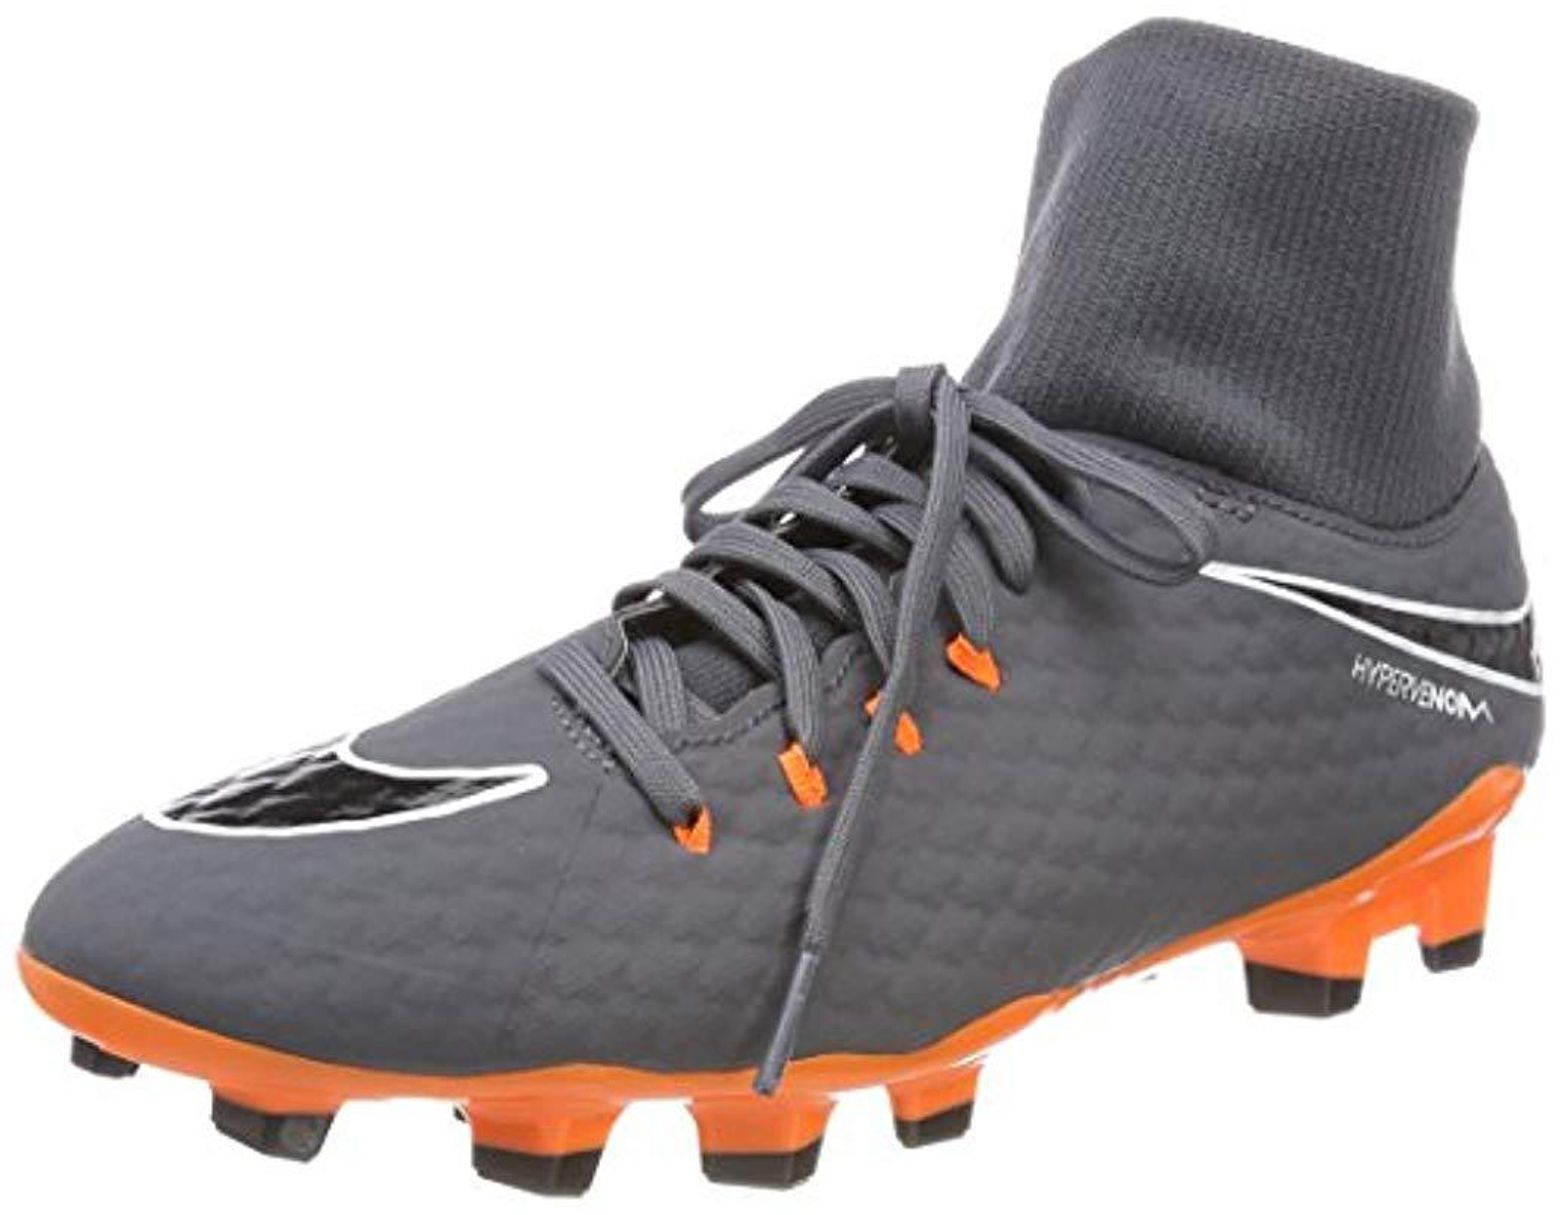 premium selection 15d0e a0bf6 Men's Gray Phantom 3 Academy Df Fg Football Boots, Dark Grey/white/total  Orange 081, 11 (46 Eu)